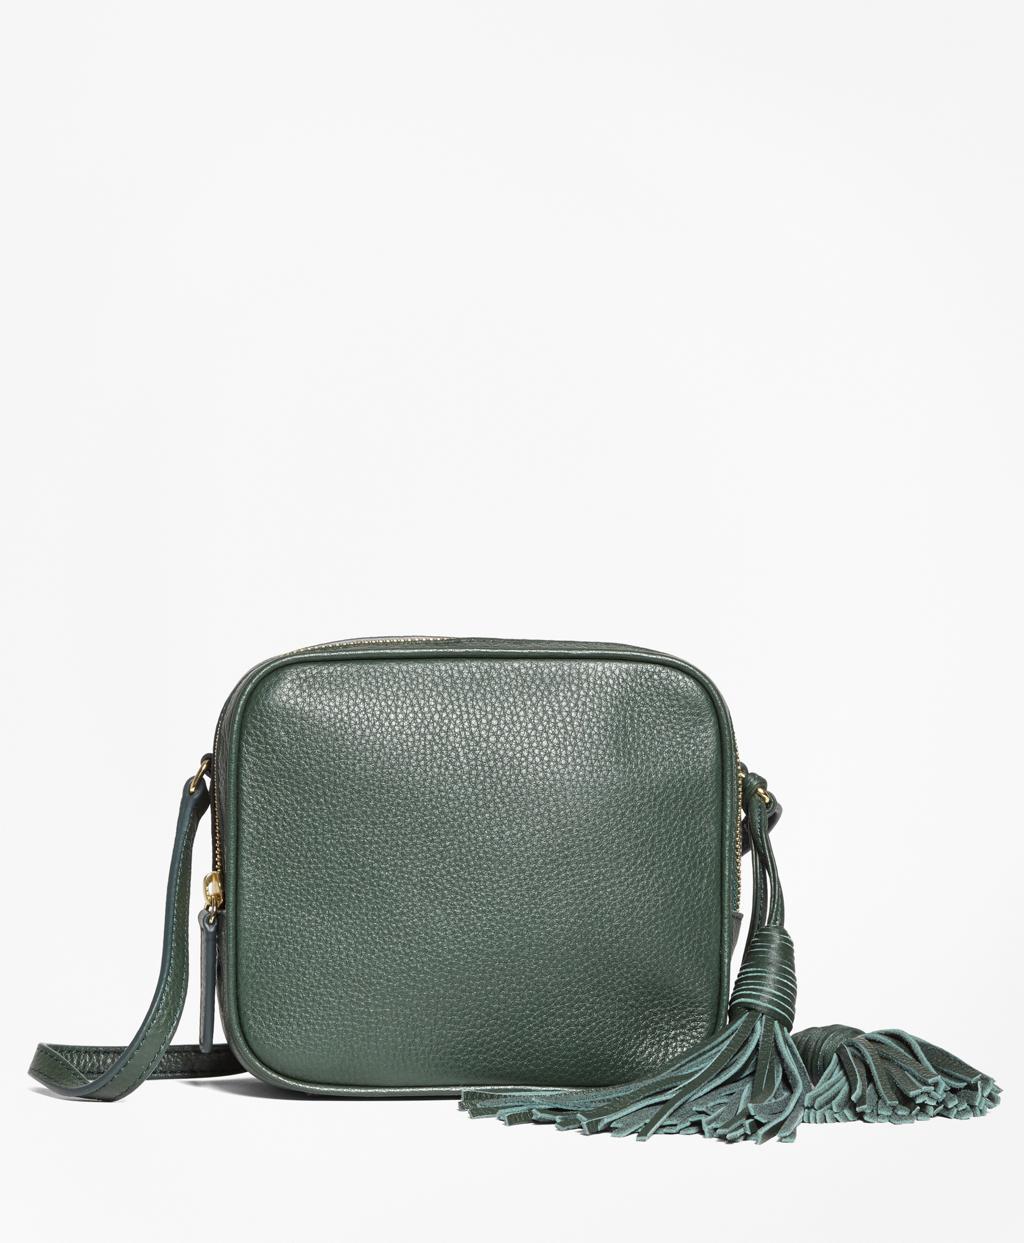 b2ca515b3797 Lyst - Brooks Brothers Tasseled Leather Cross-body Bag in Green